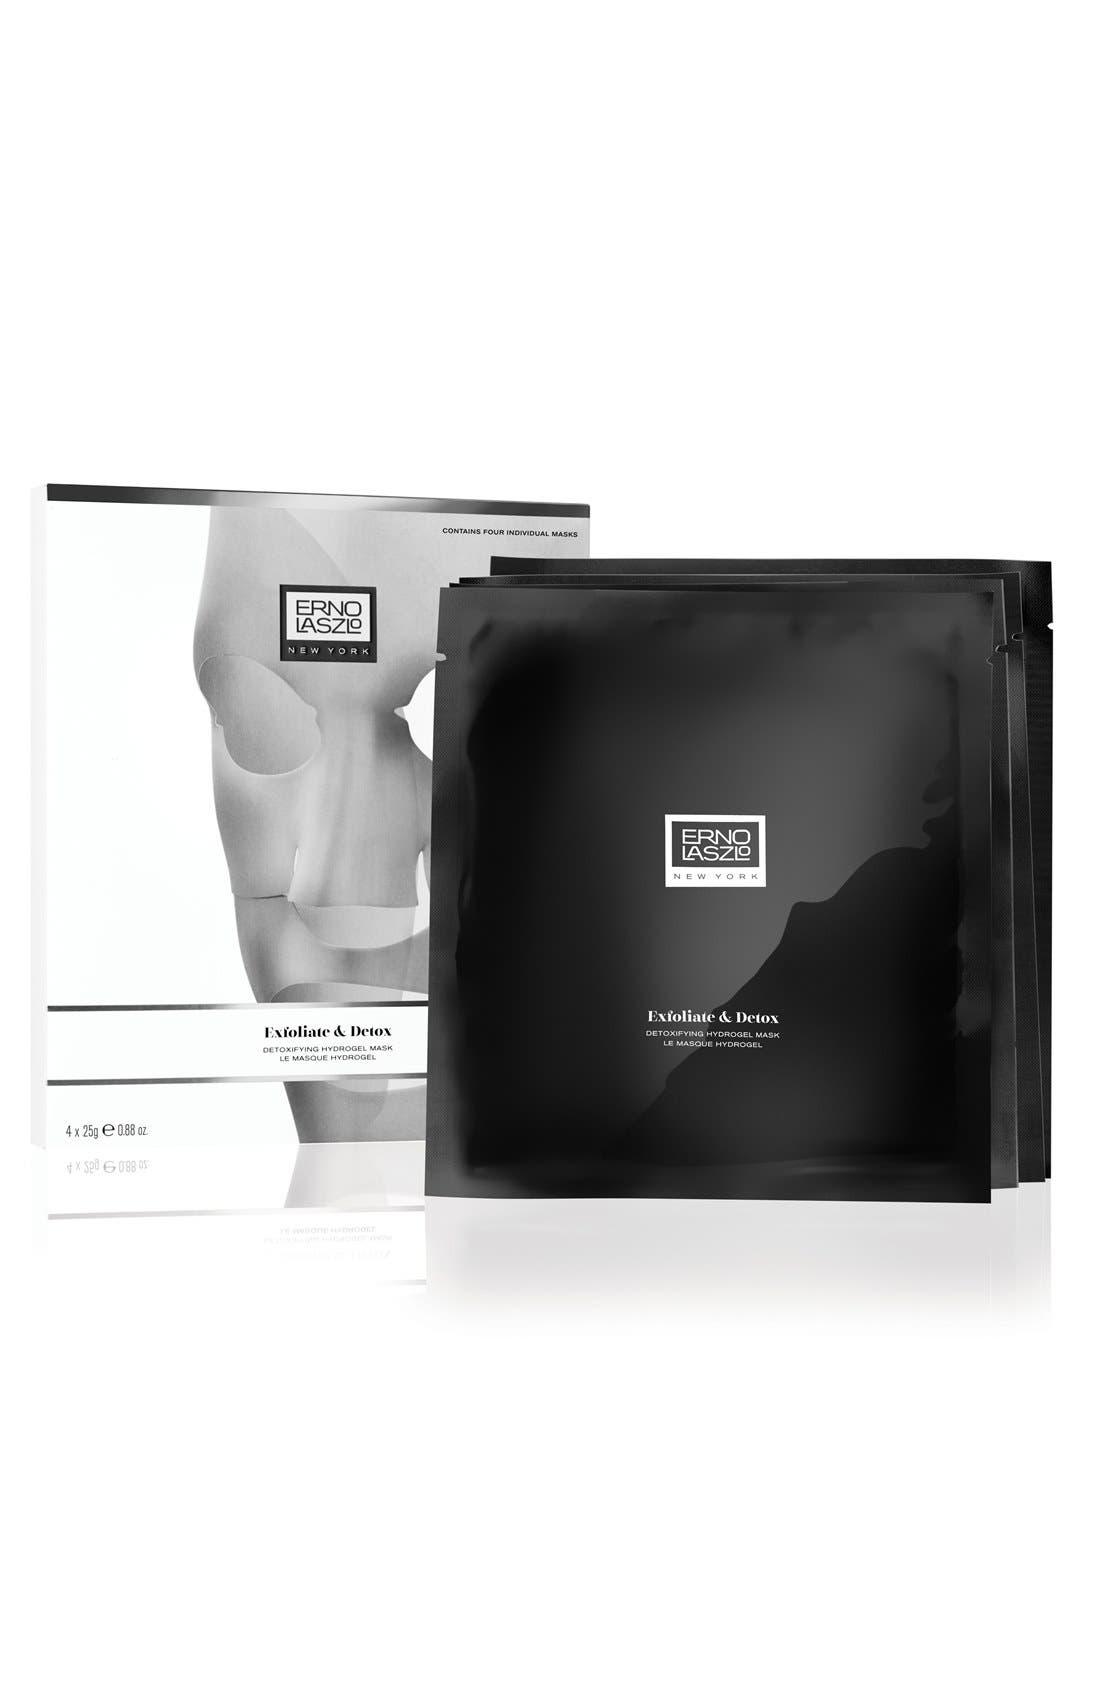 Exfoliate & Detox Hydrogel Mask